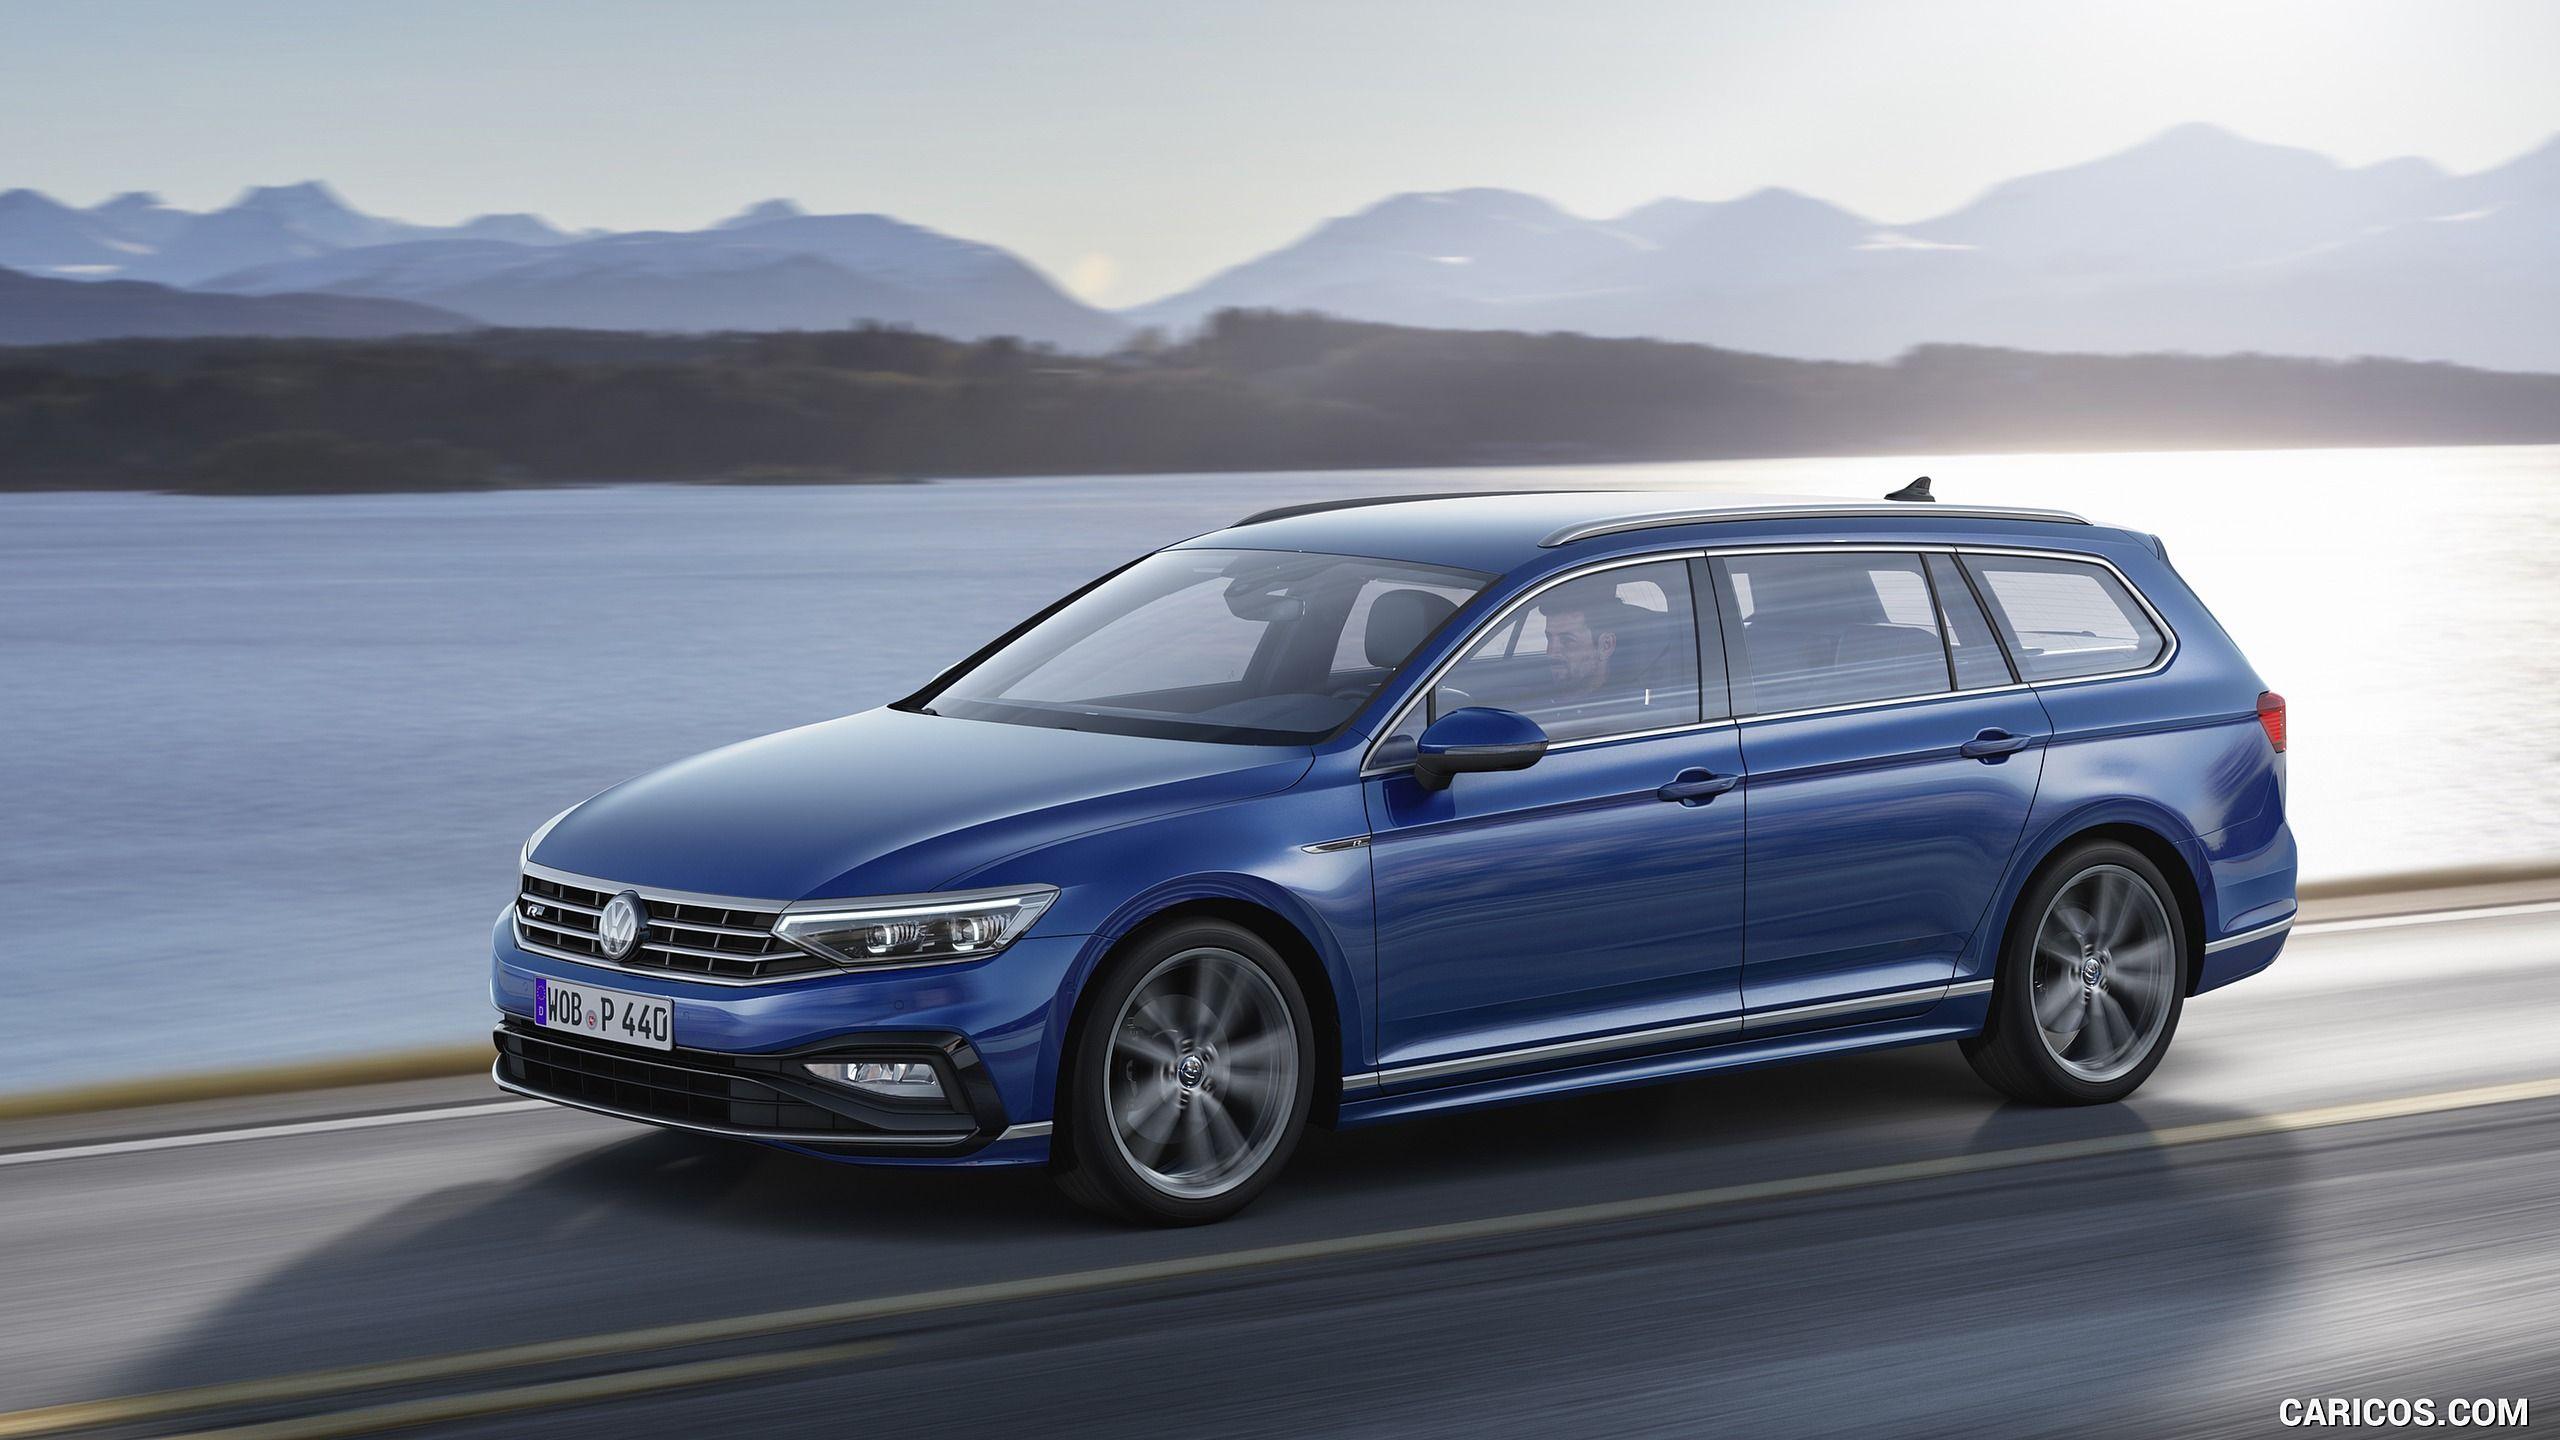 2020 Volkswagen Passat Variant Eu Spec Front Three Quarter Hd Vw Passat Car Volkswagen Jetta Wagon